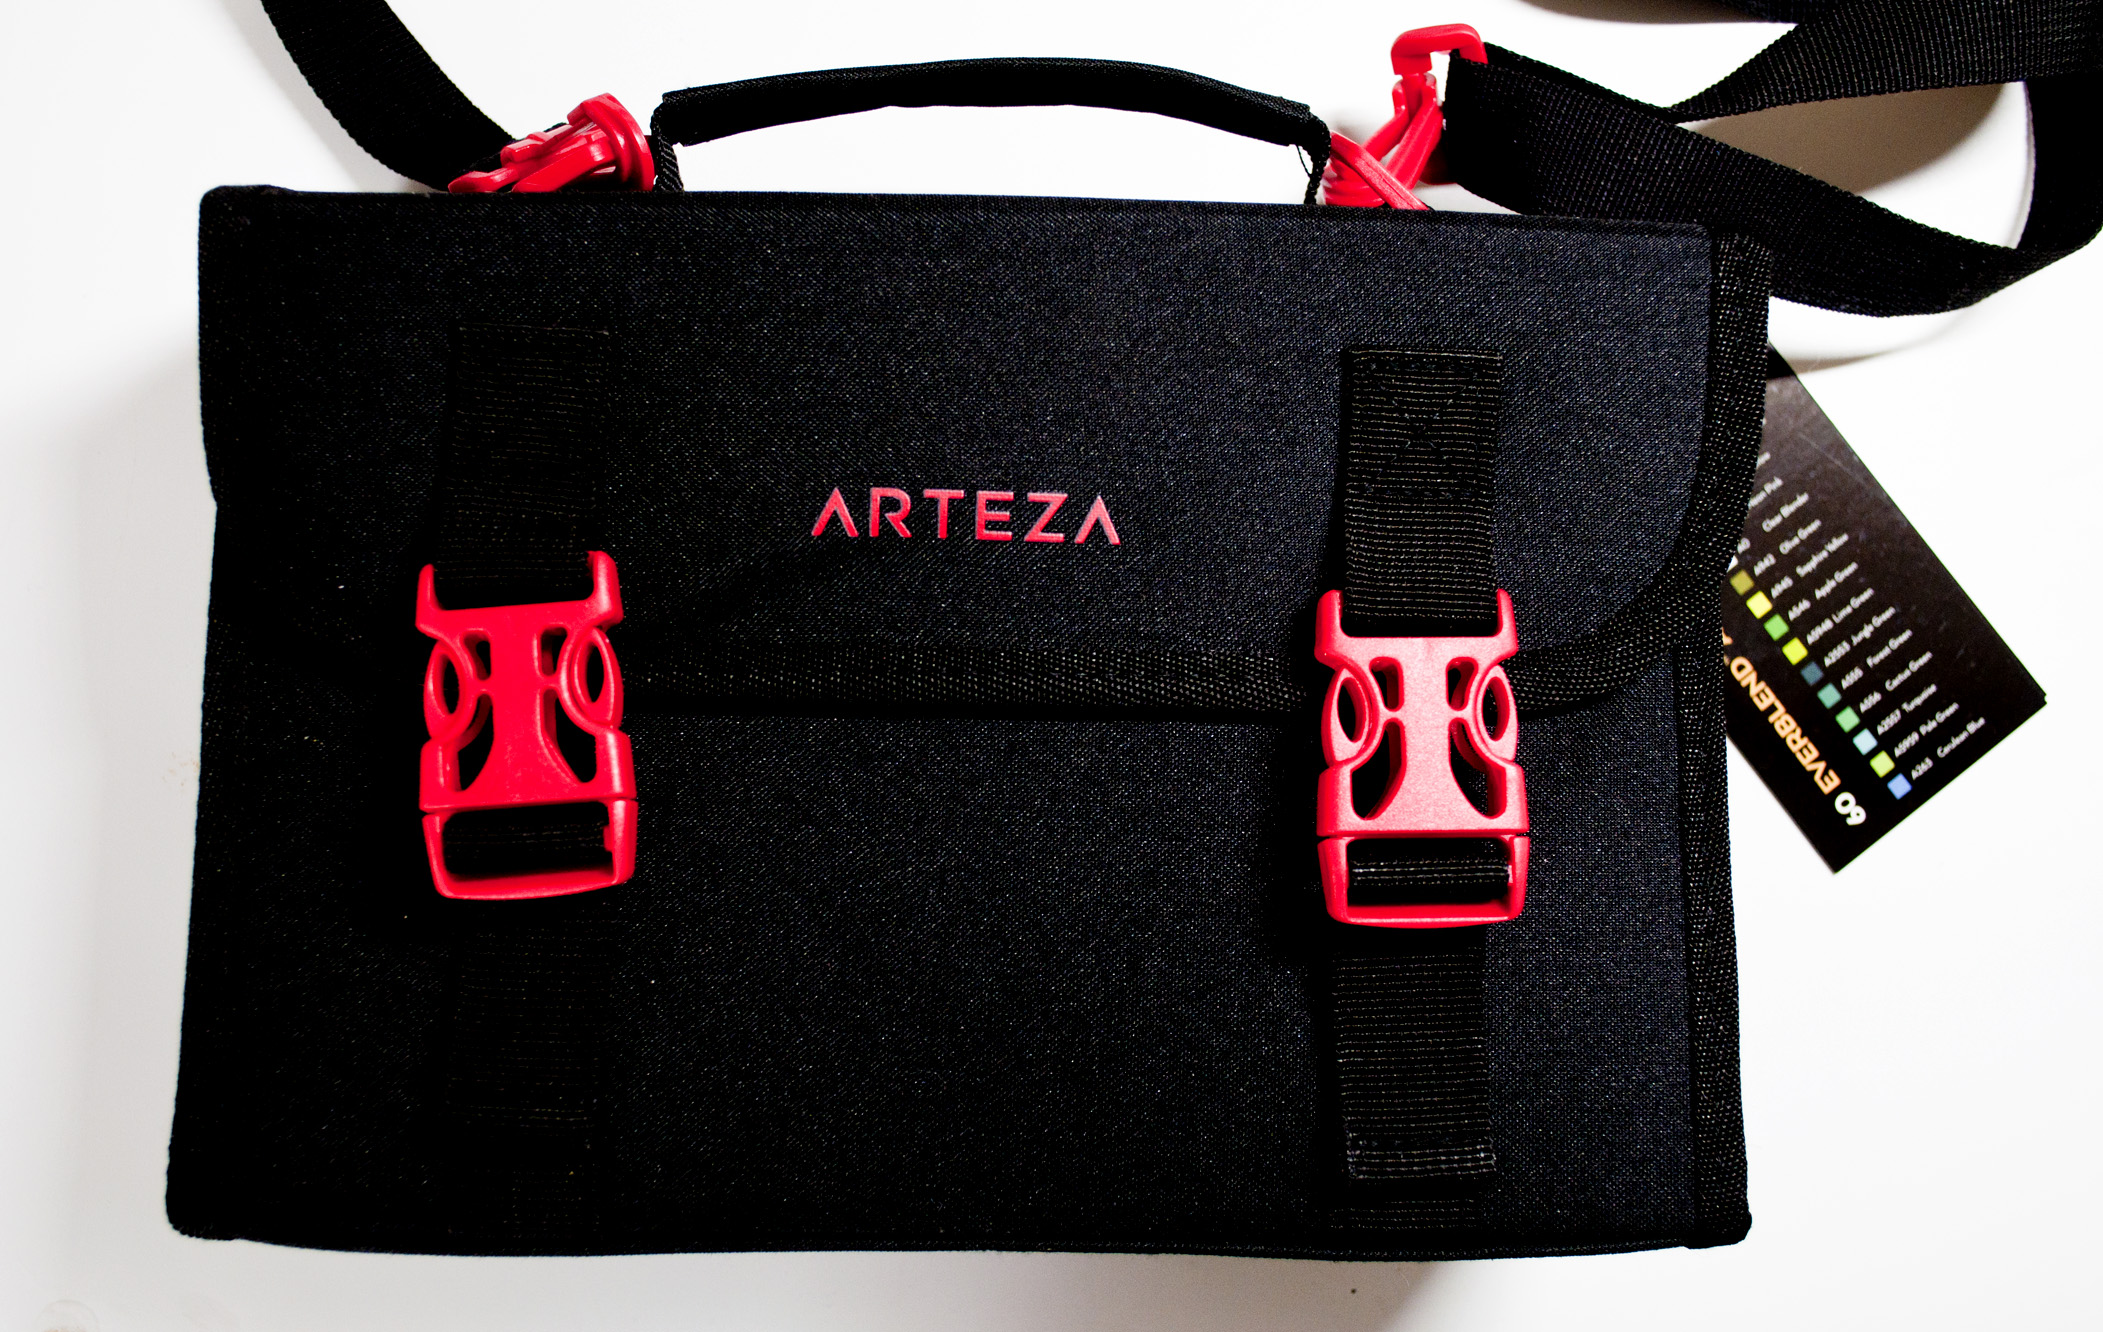 Arteza MArker Bag.jpg